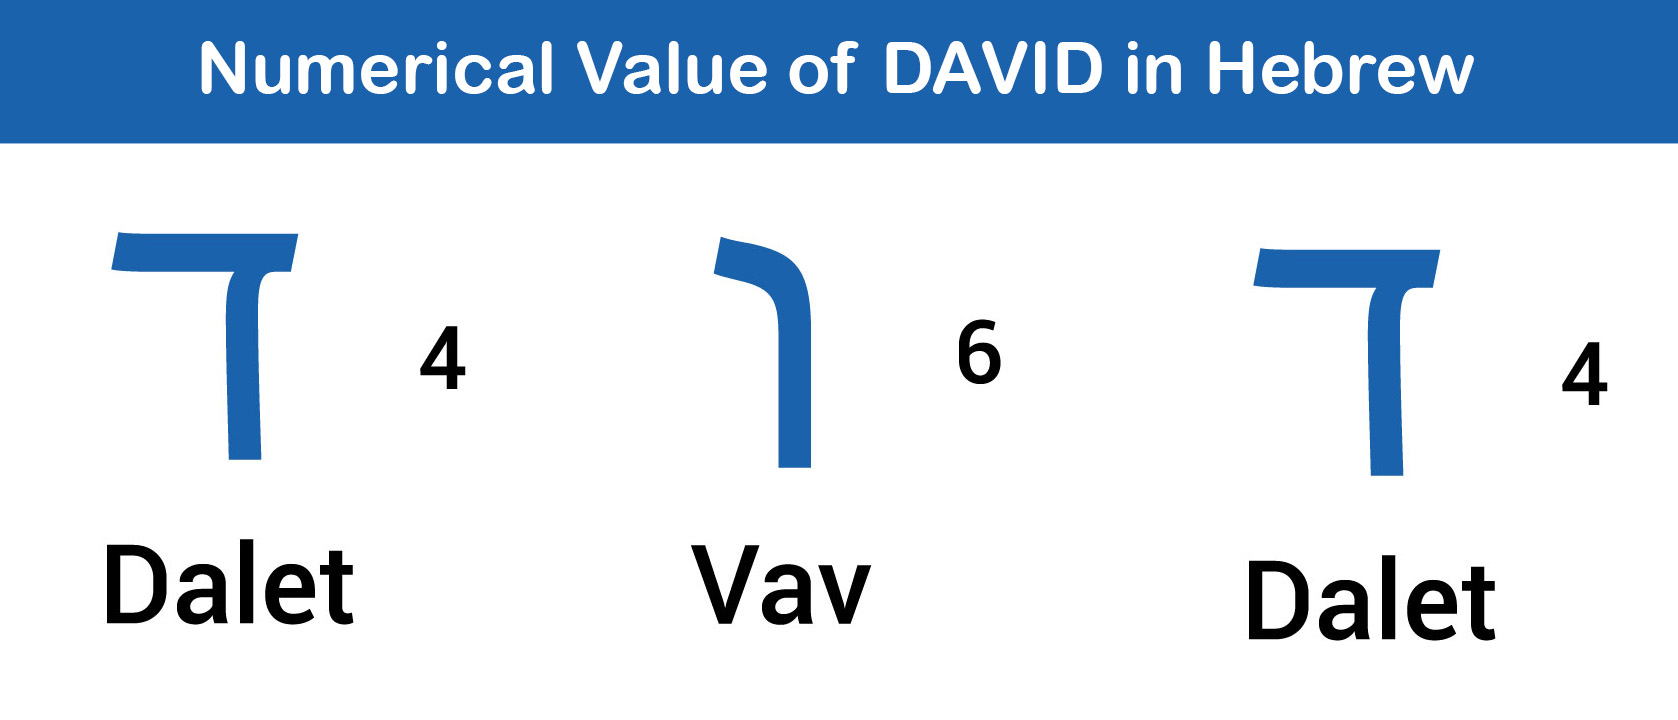 Numerical Value of David in Hebrew